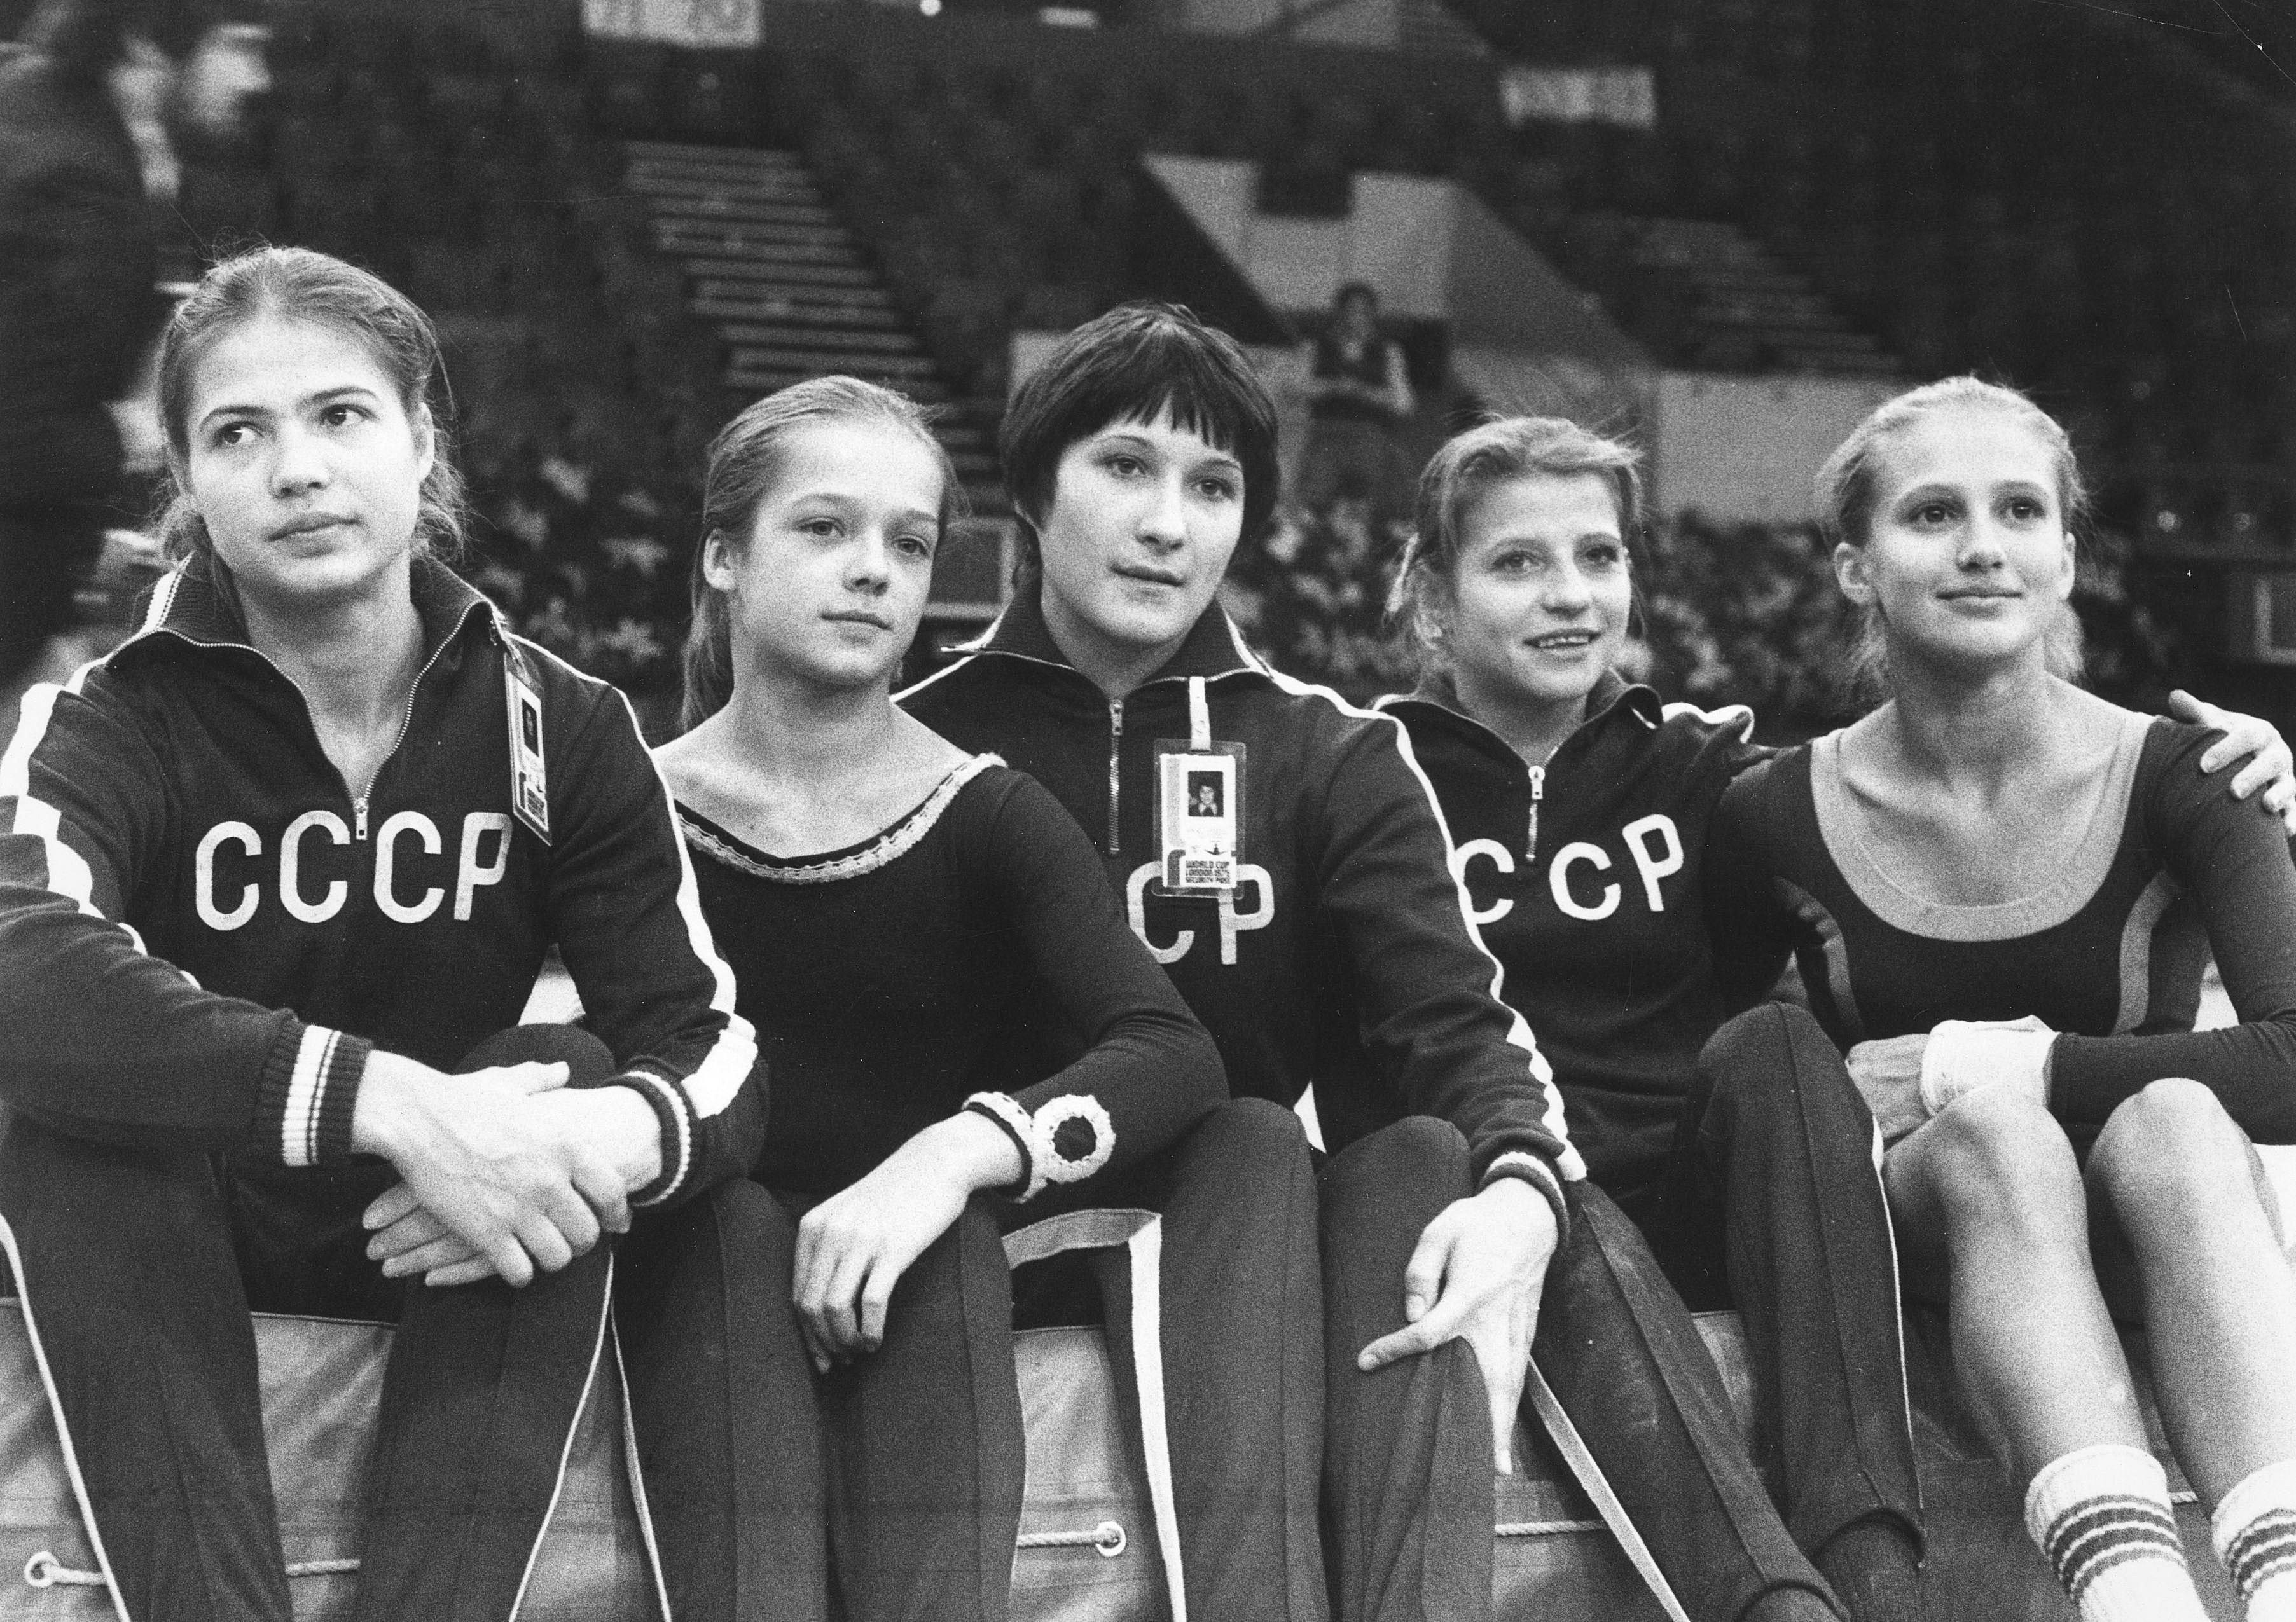 Ludmilla Tourischeva, Olga Korbut, Soviet gymnasts